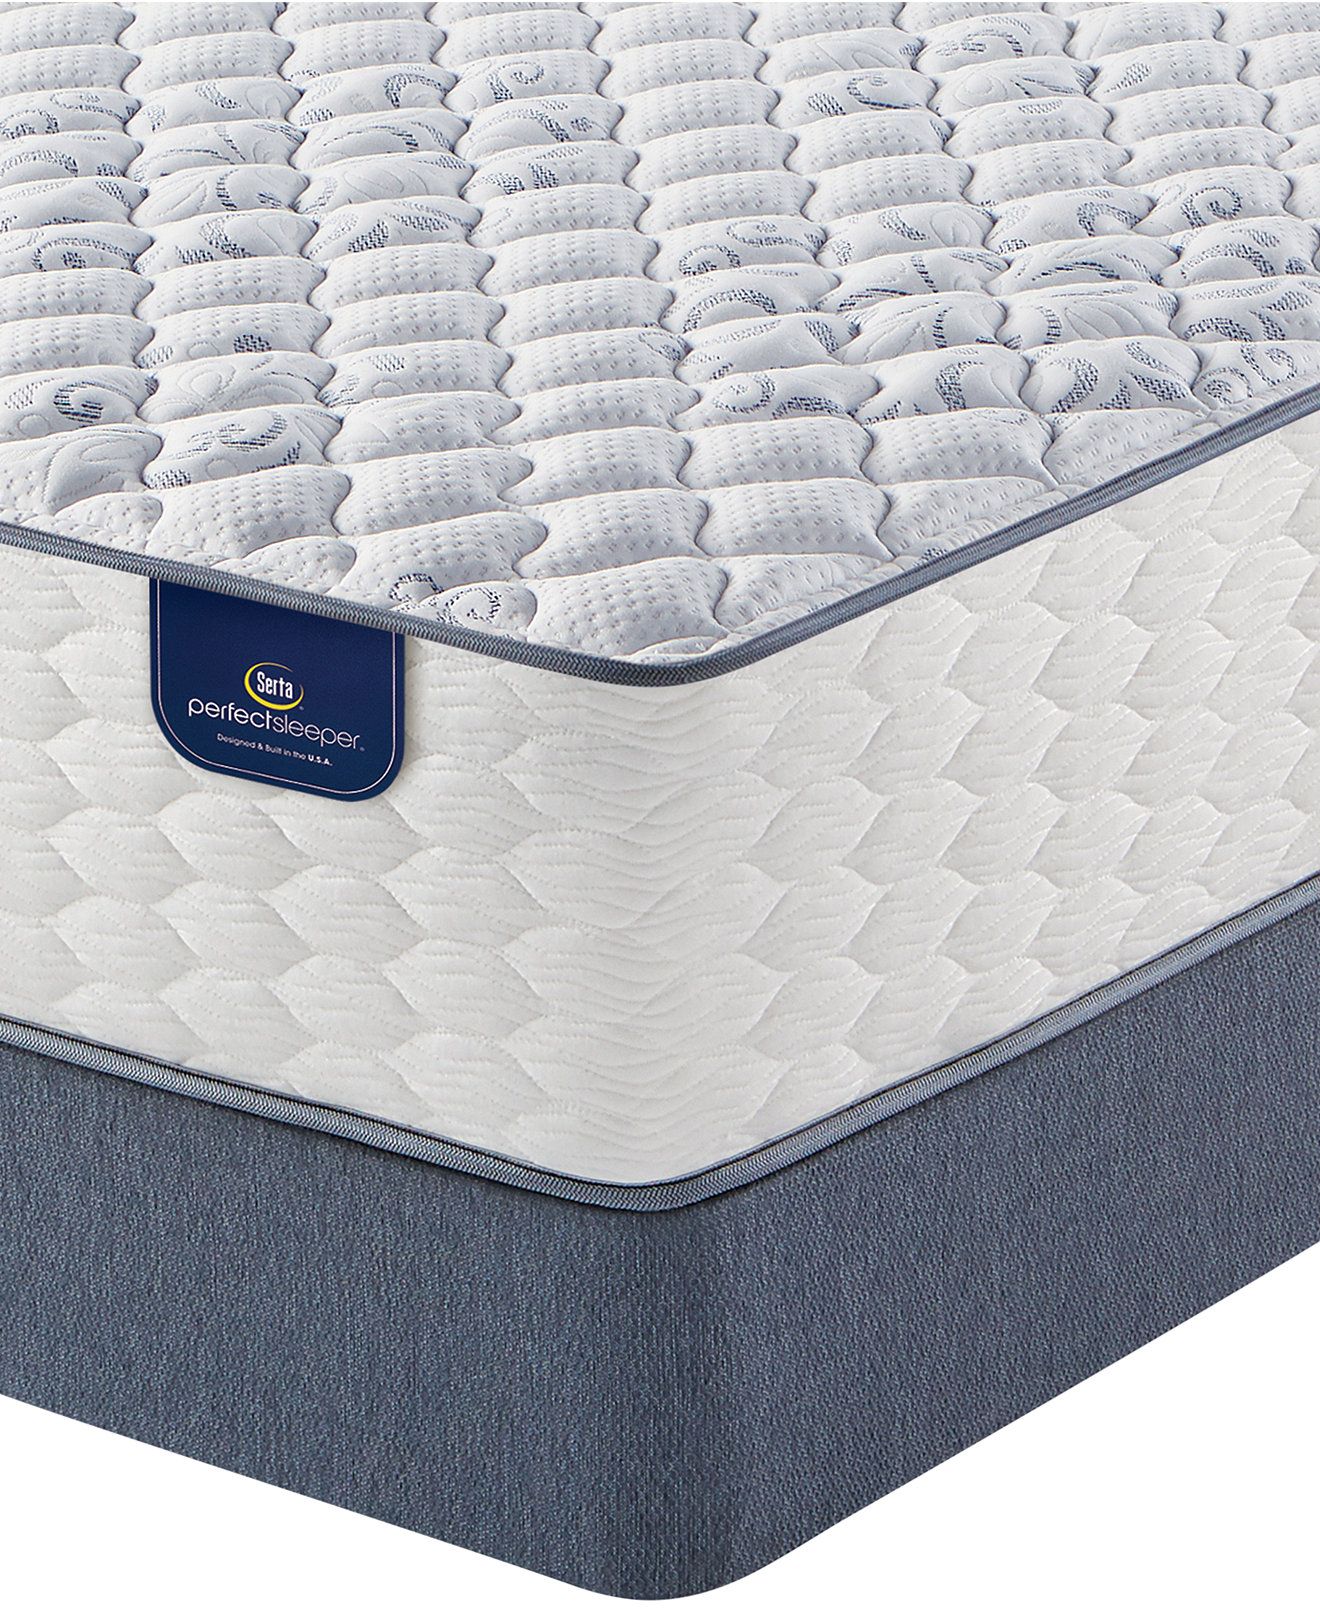 "Serta Perfect Sleeper® Graceful Haven 12"" Cushion Firm Mattress Collection"